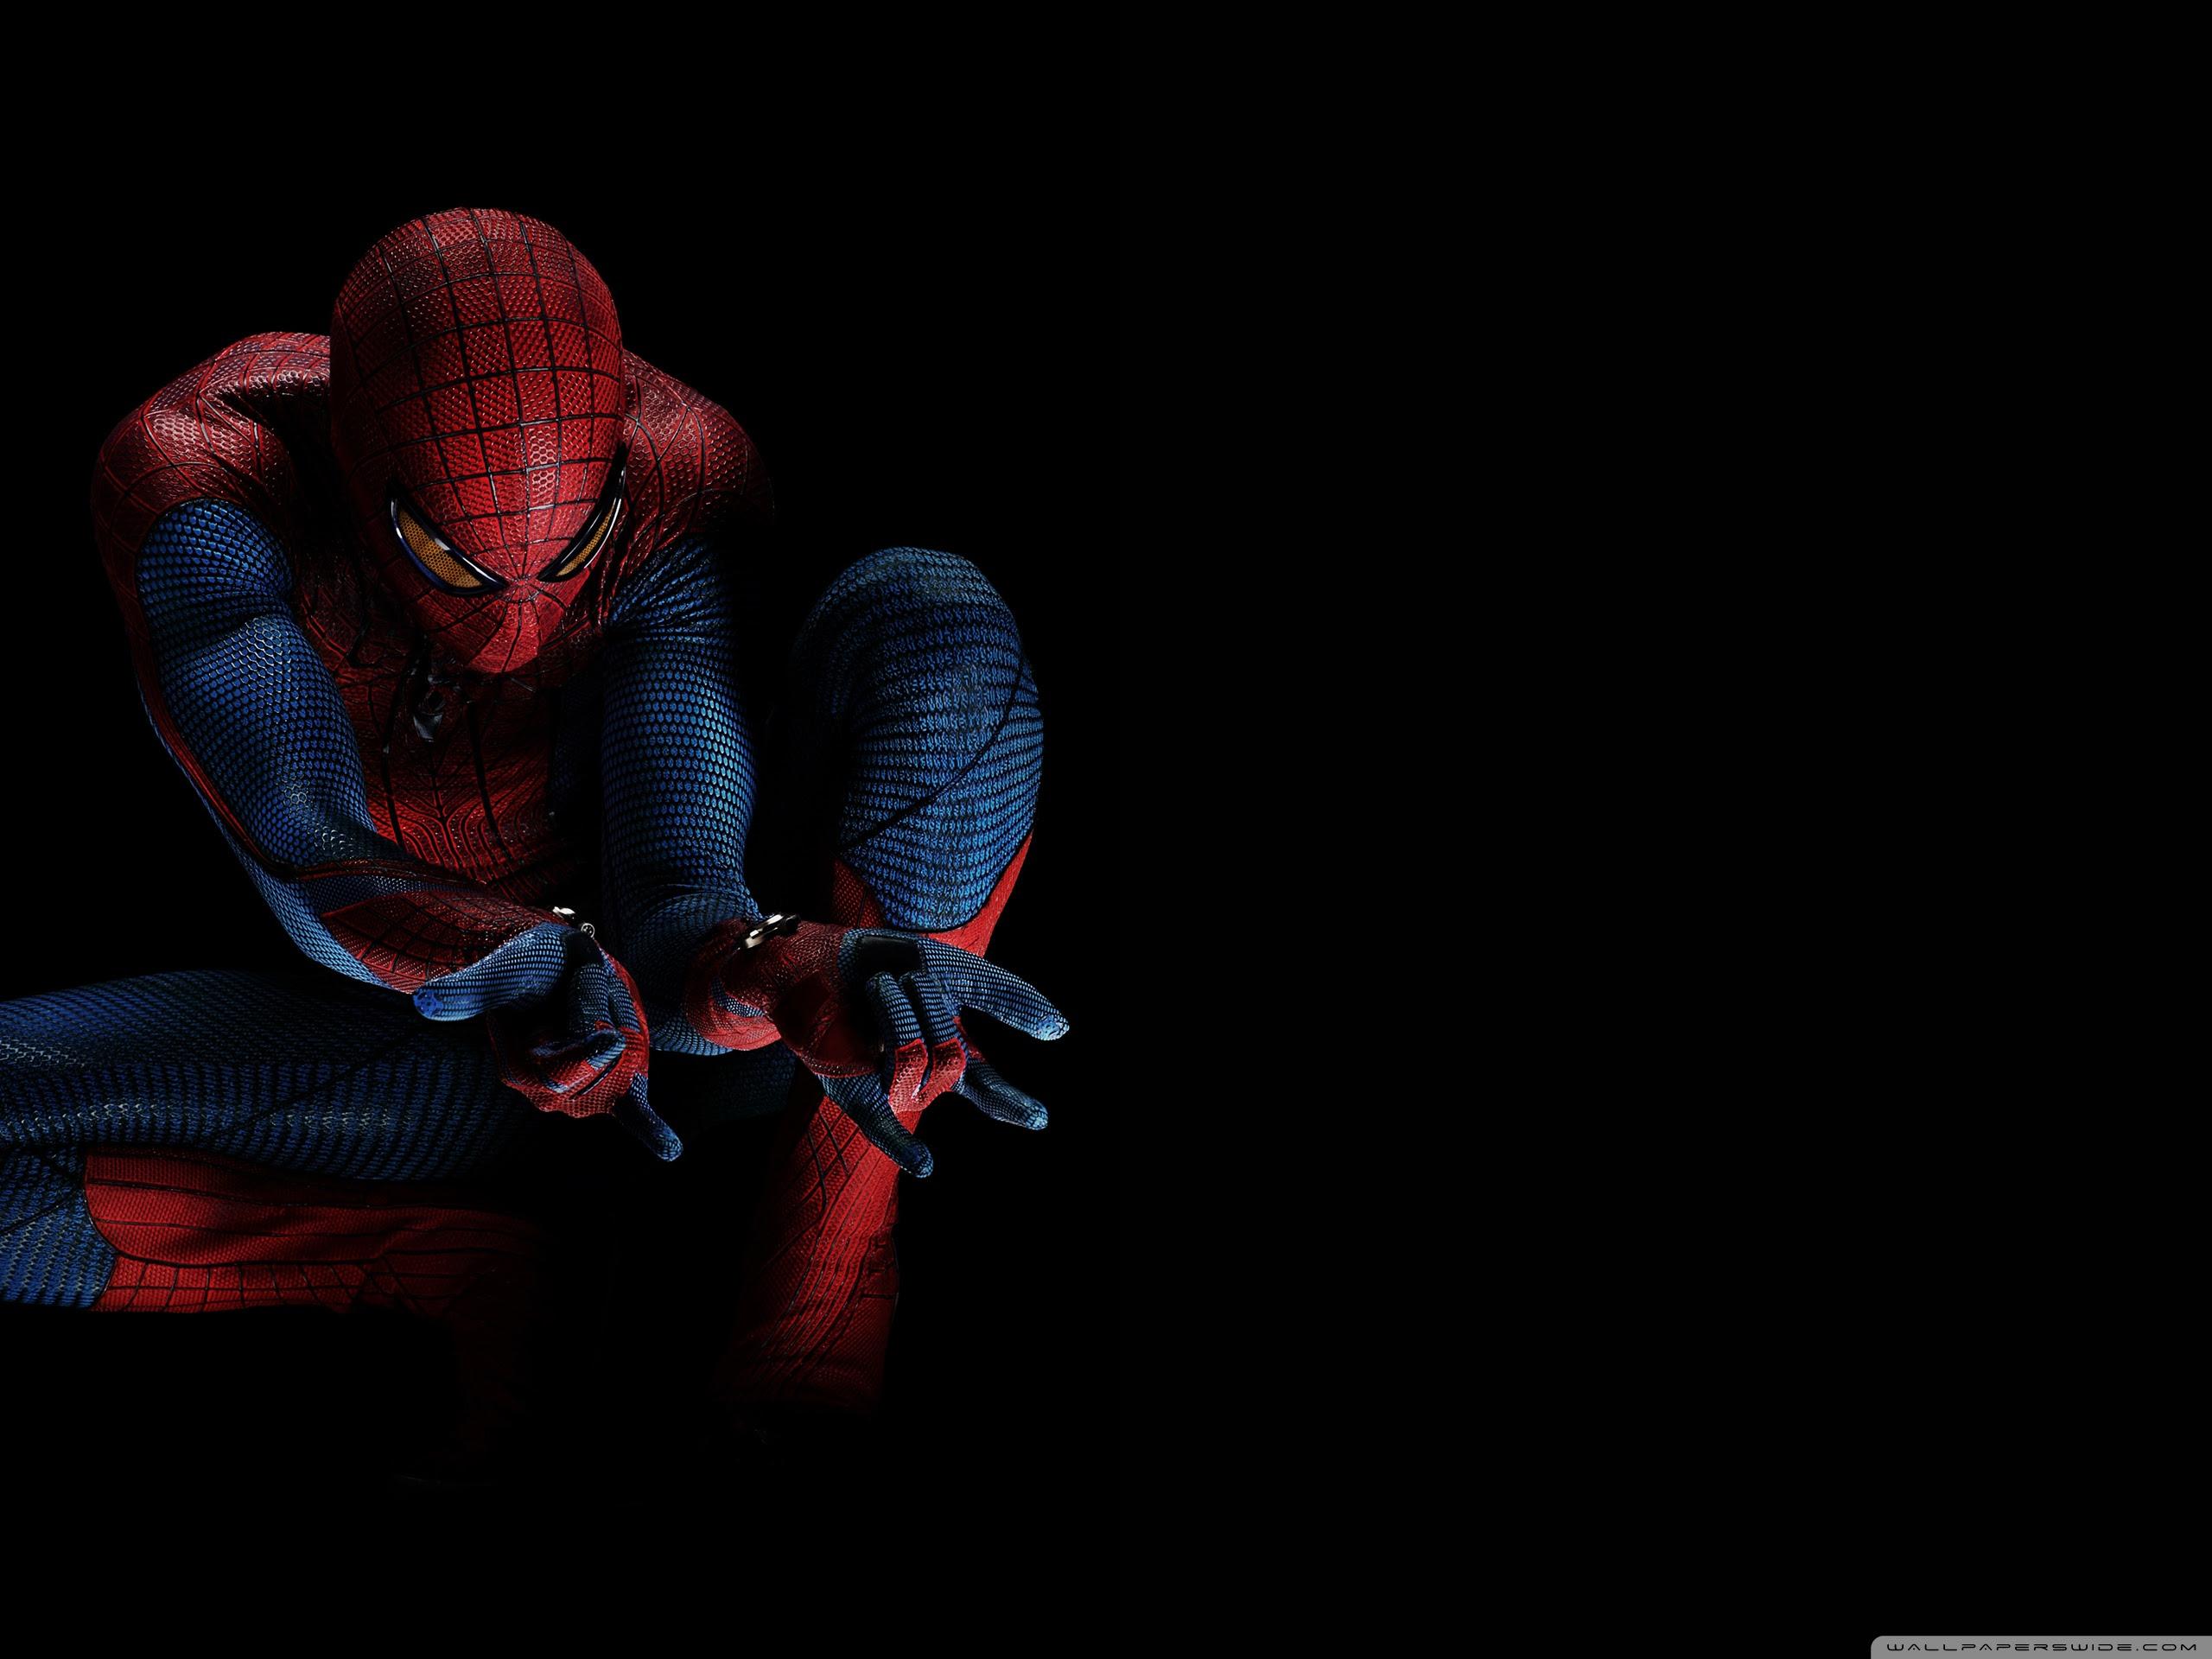 WallpapersWidecom Spider Man HD Desktop Wallpapers For 4K